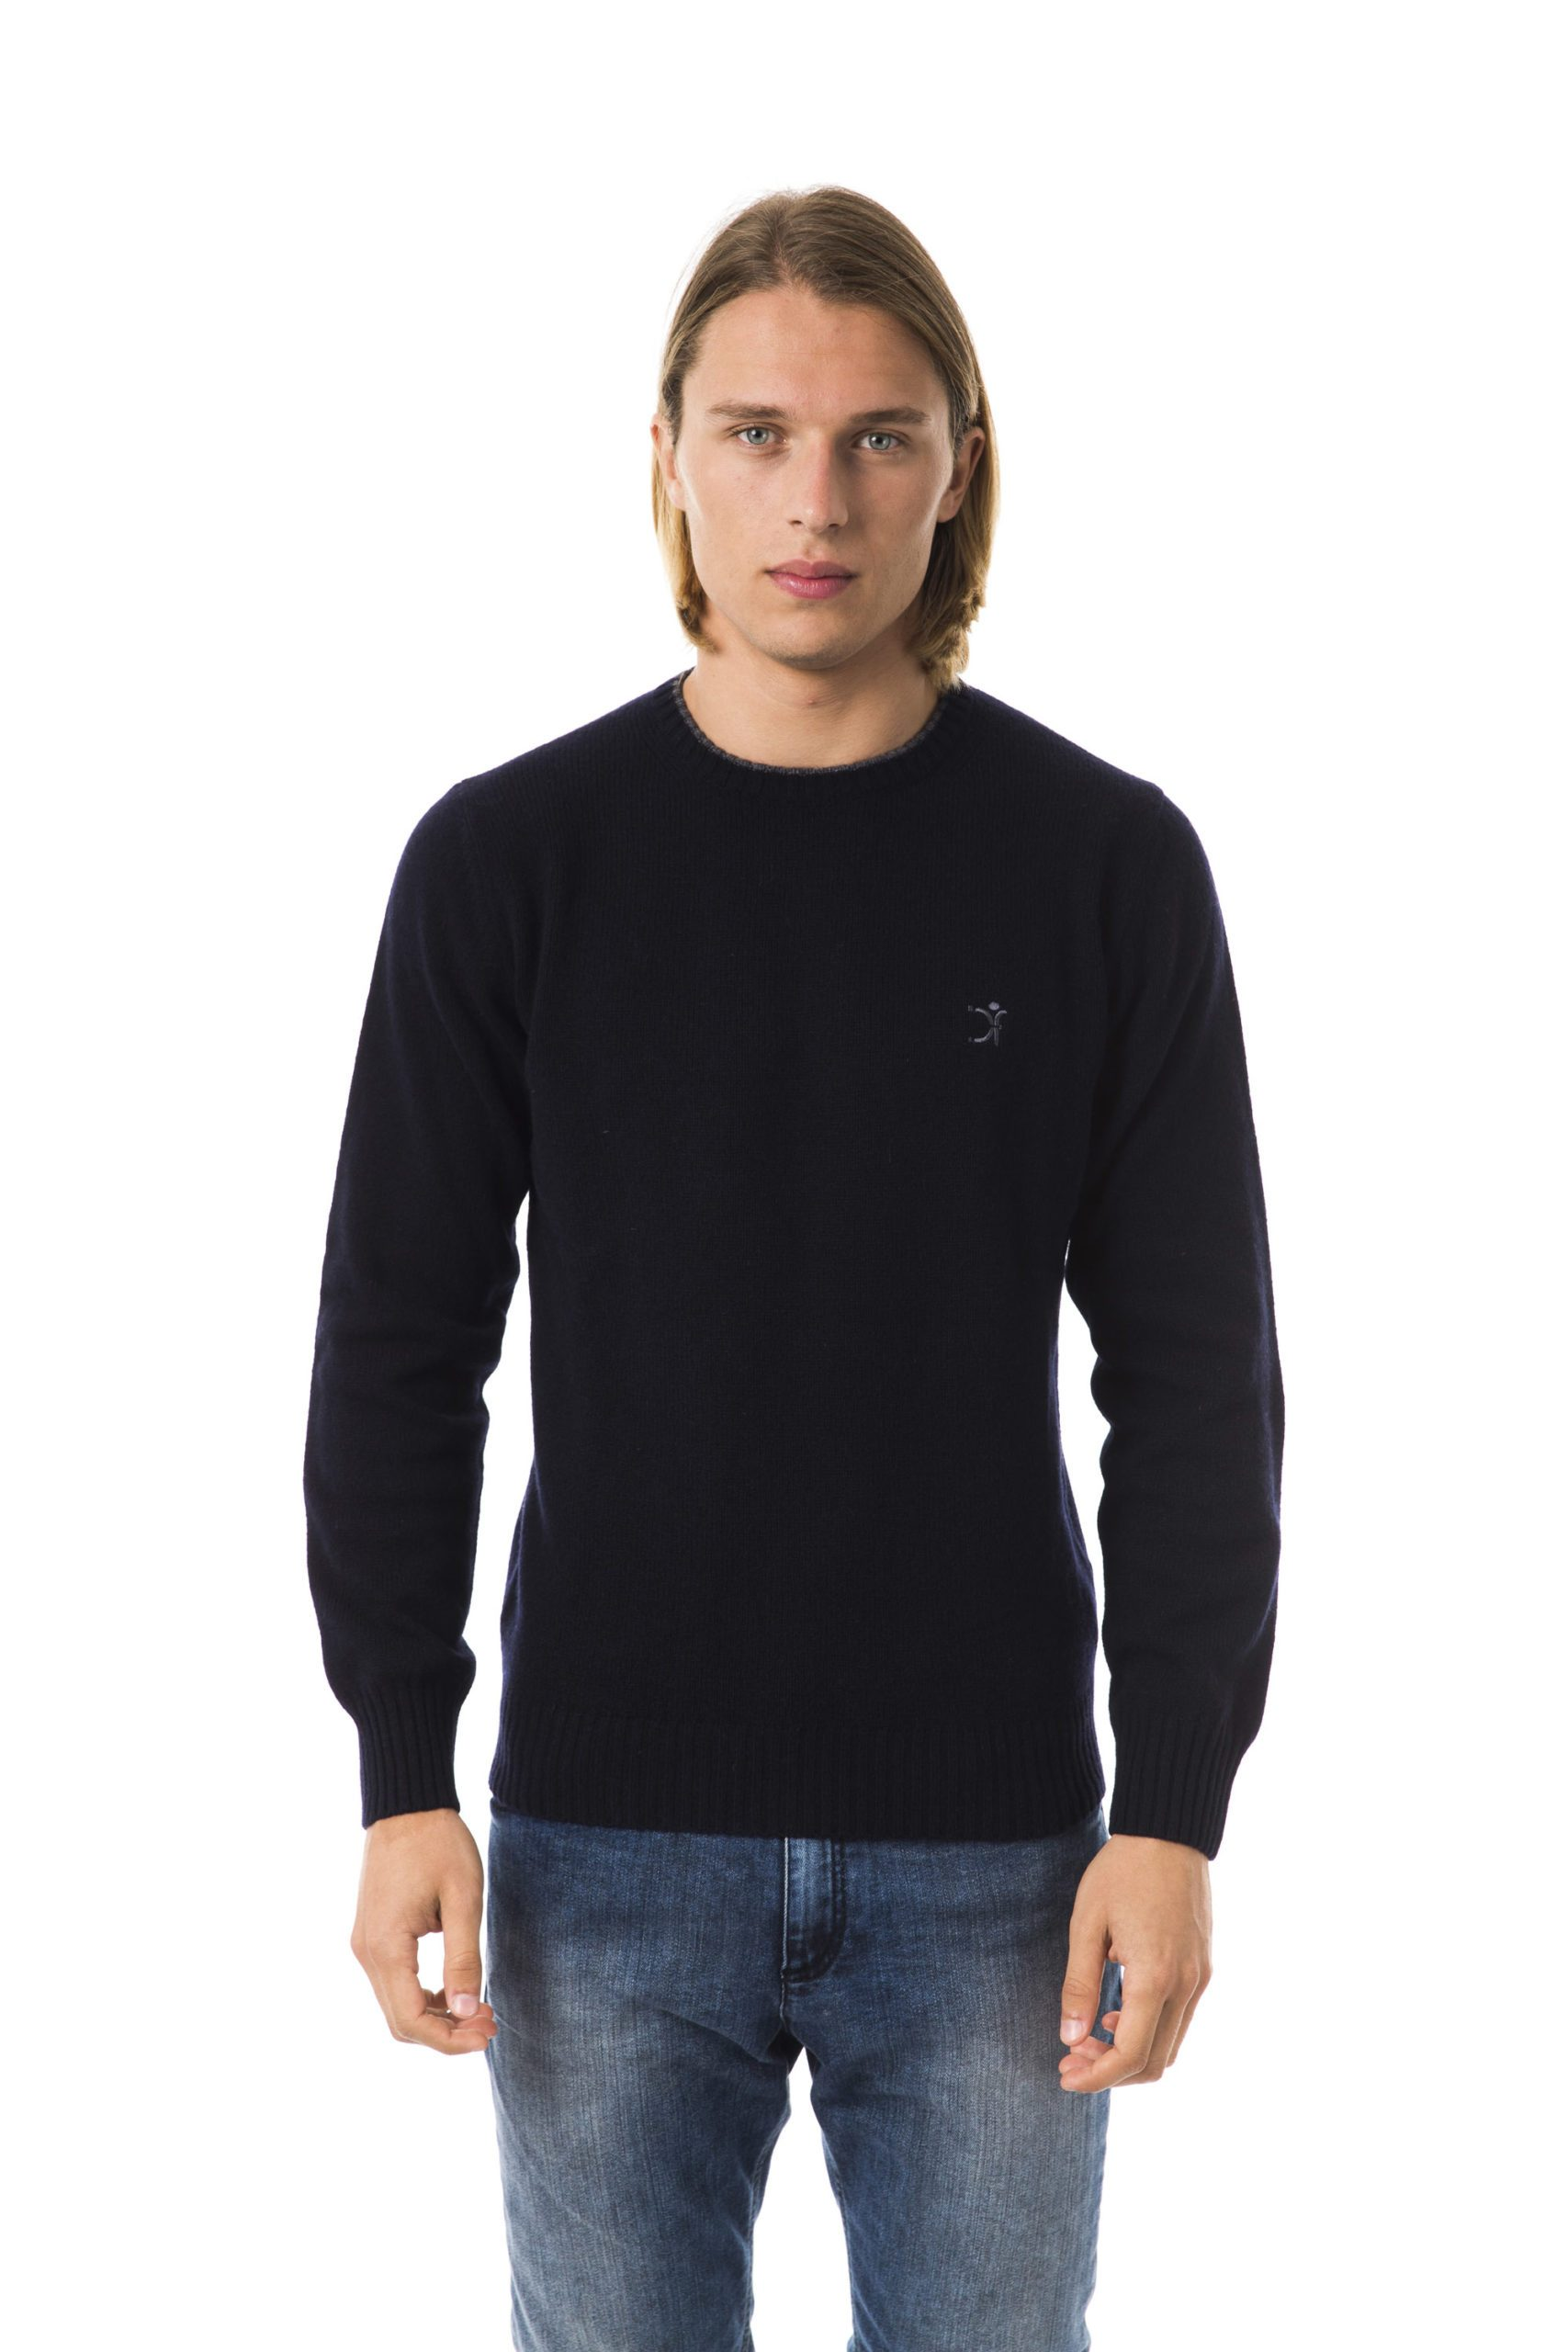 Uominitaliani Men's Sweater Blue UO816589 - S